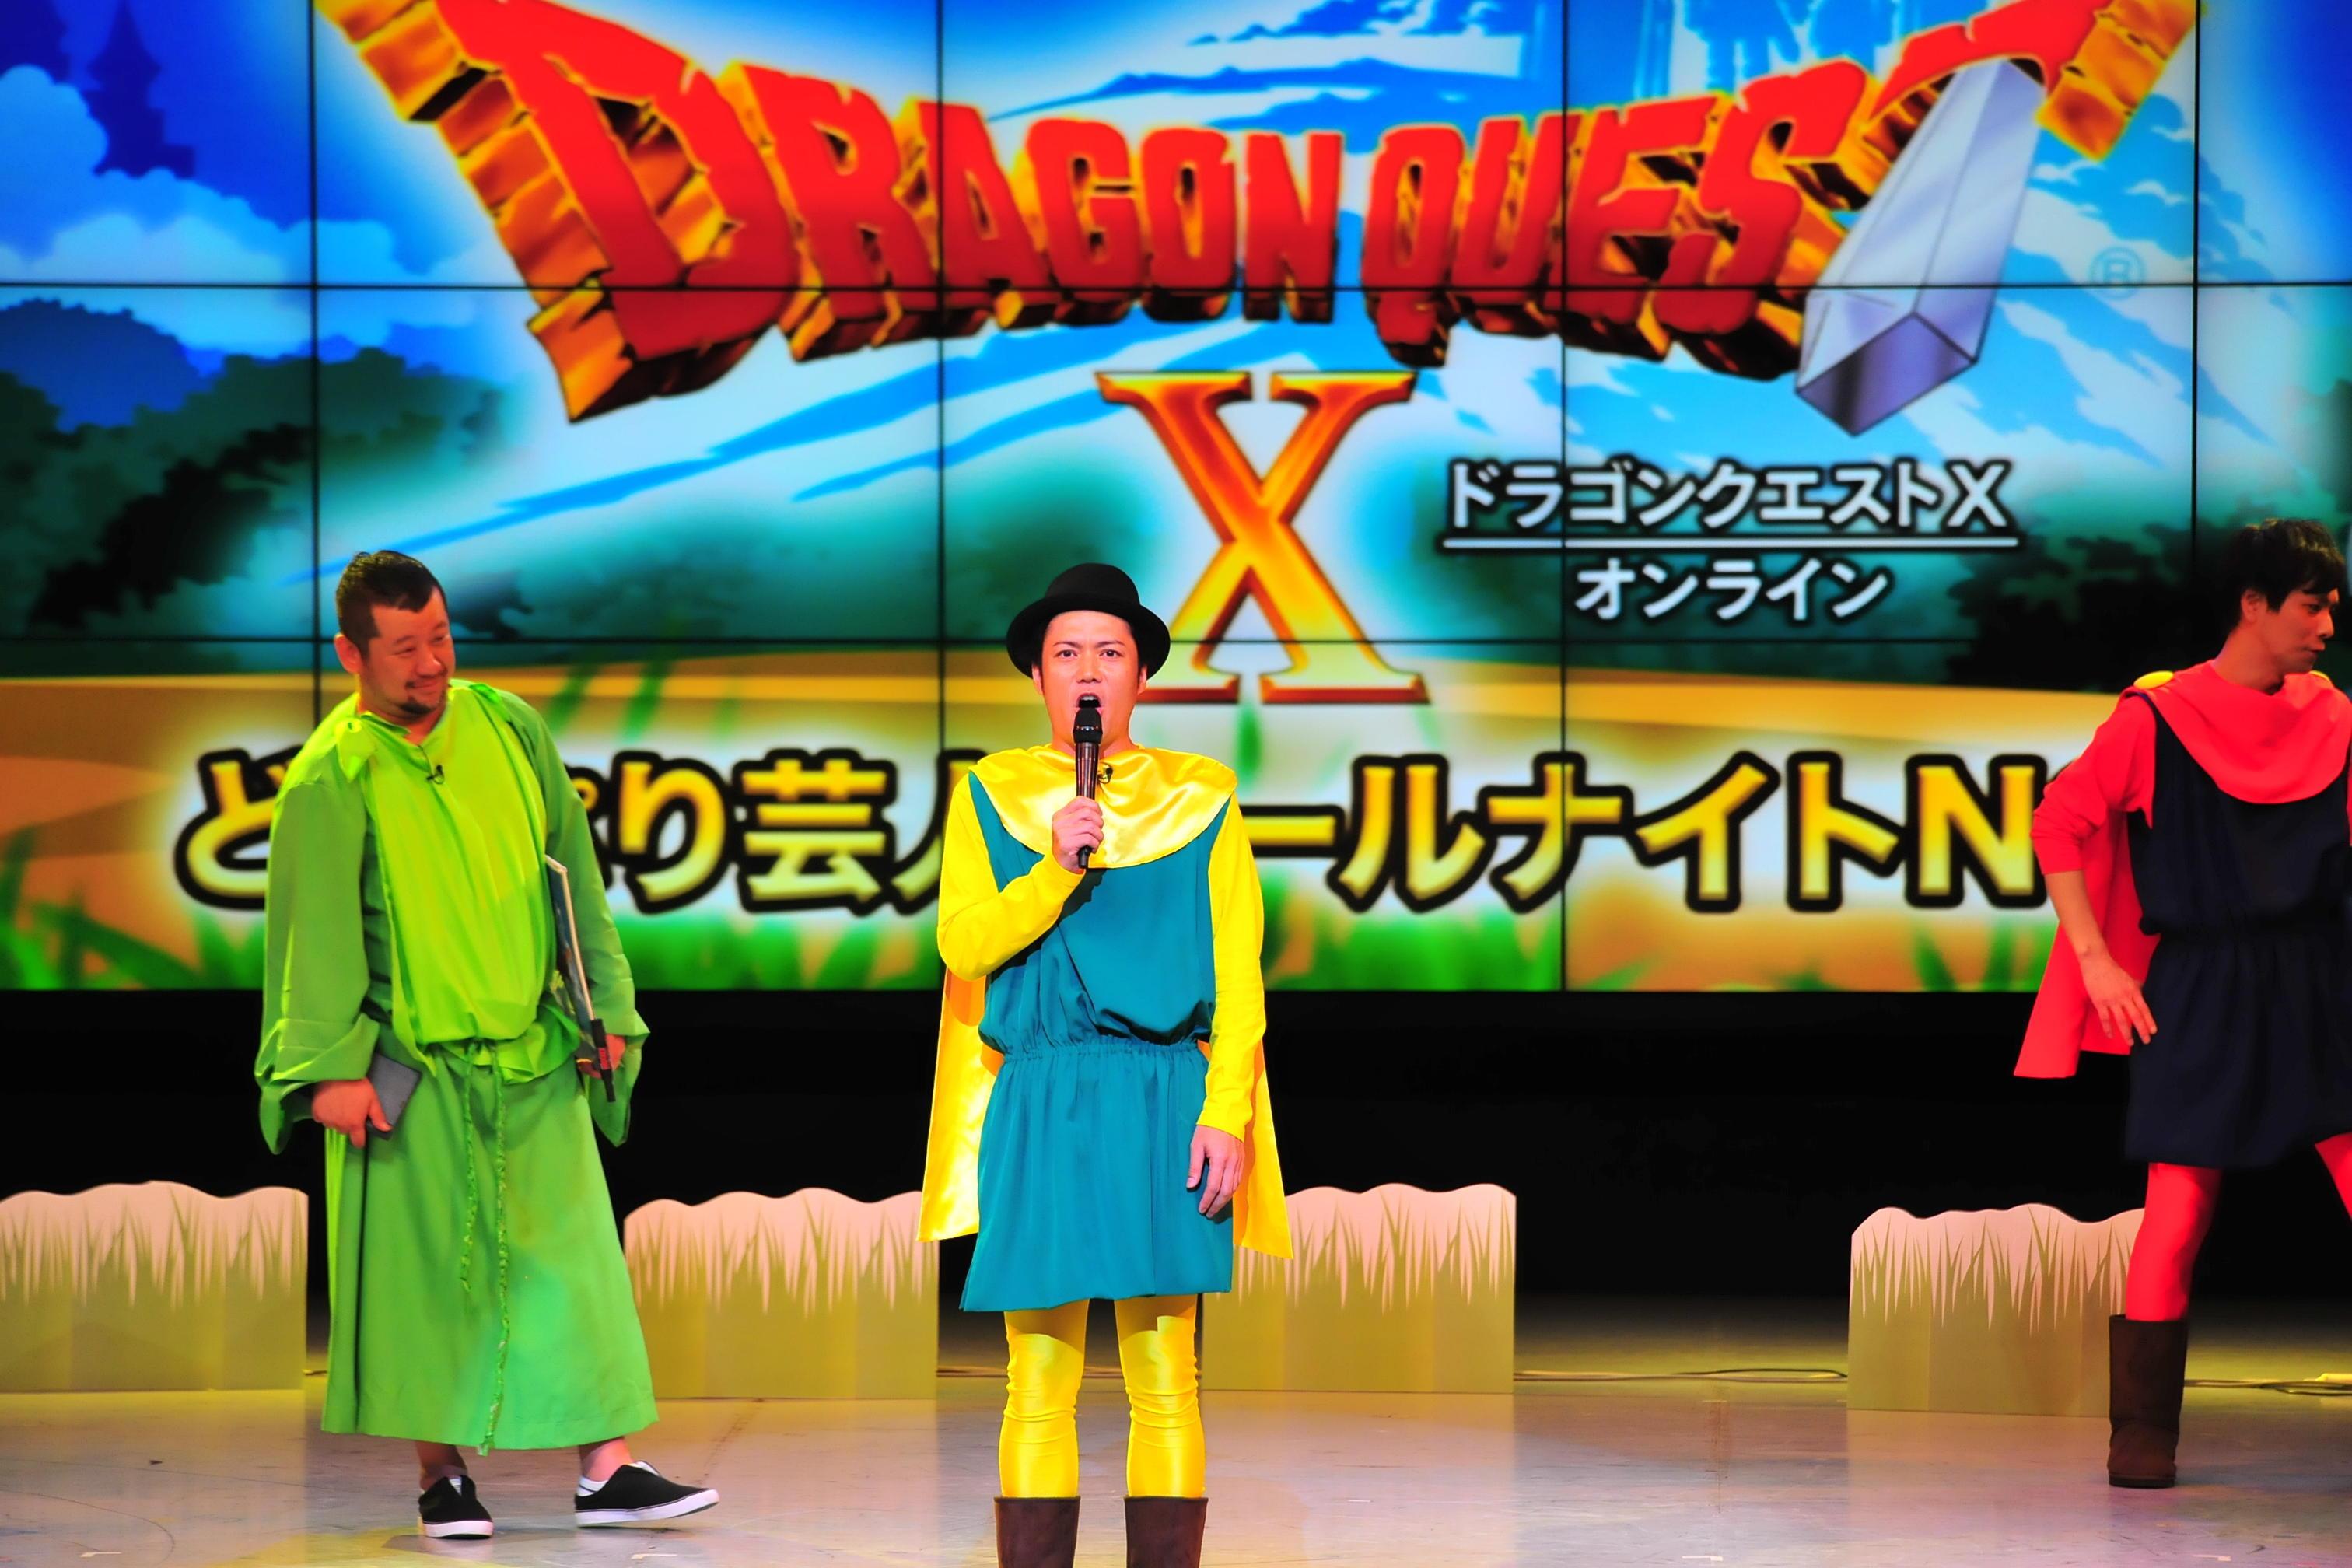 http://news.yoshimoto.co.jp/20160613100419-11608d00ba756e6a874682e1d8693d19a07b274d.jpg